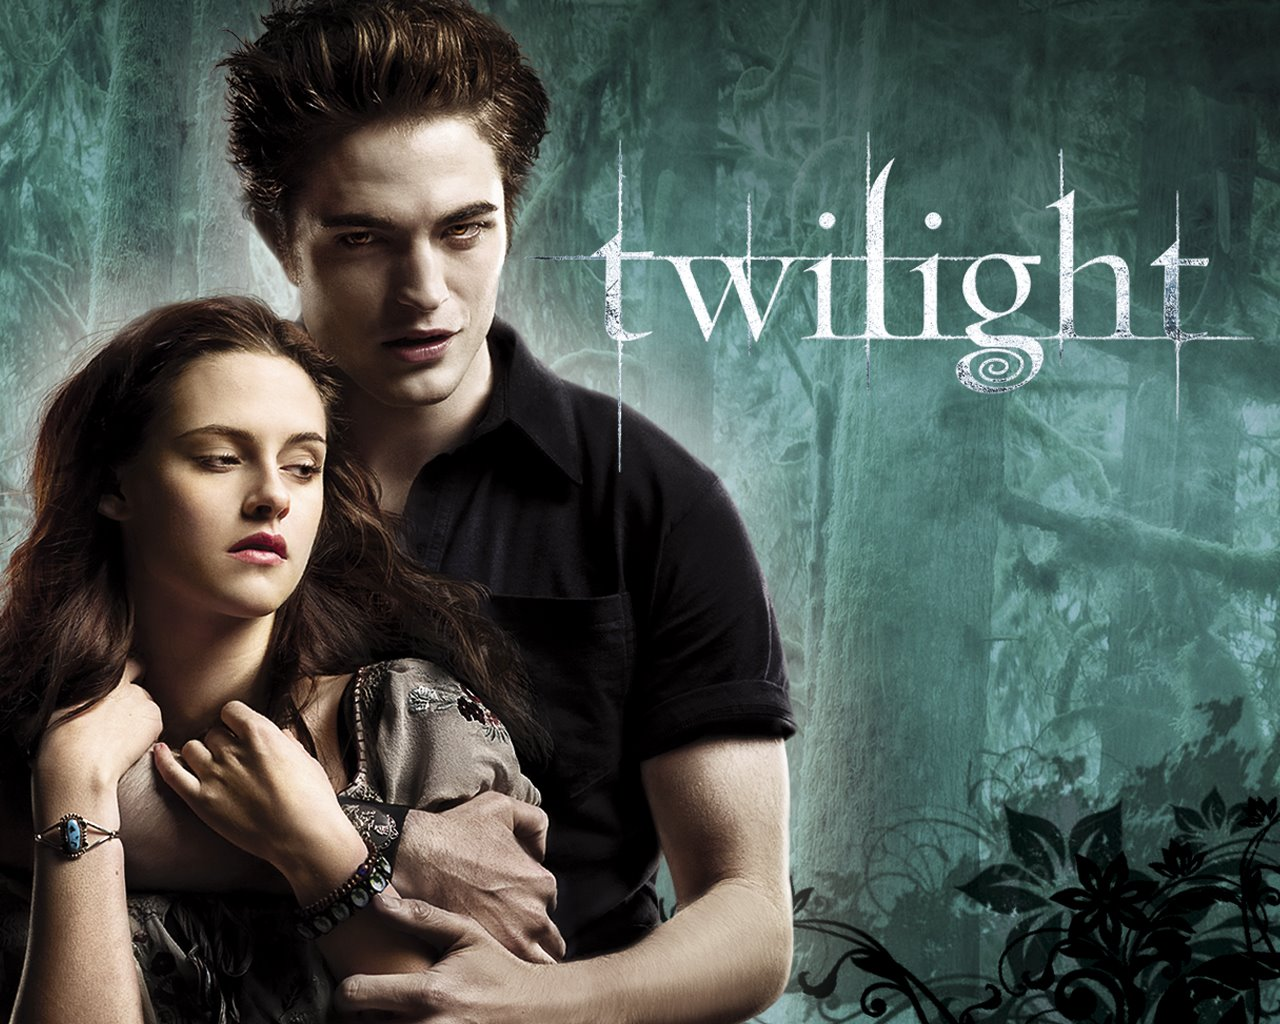 http://4.bp.blogspot.com/-hDg0yyuf-qI/UBP8vDTzjMI/AAAAAAAAGqE/iCULc-rGW-s/s1600/Twilight+movie+poster.jpg